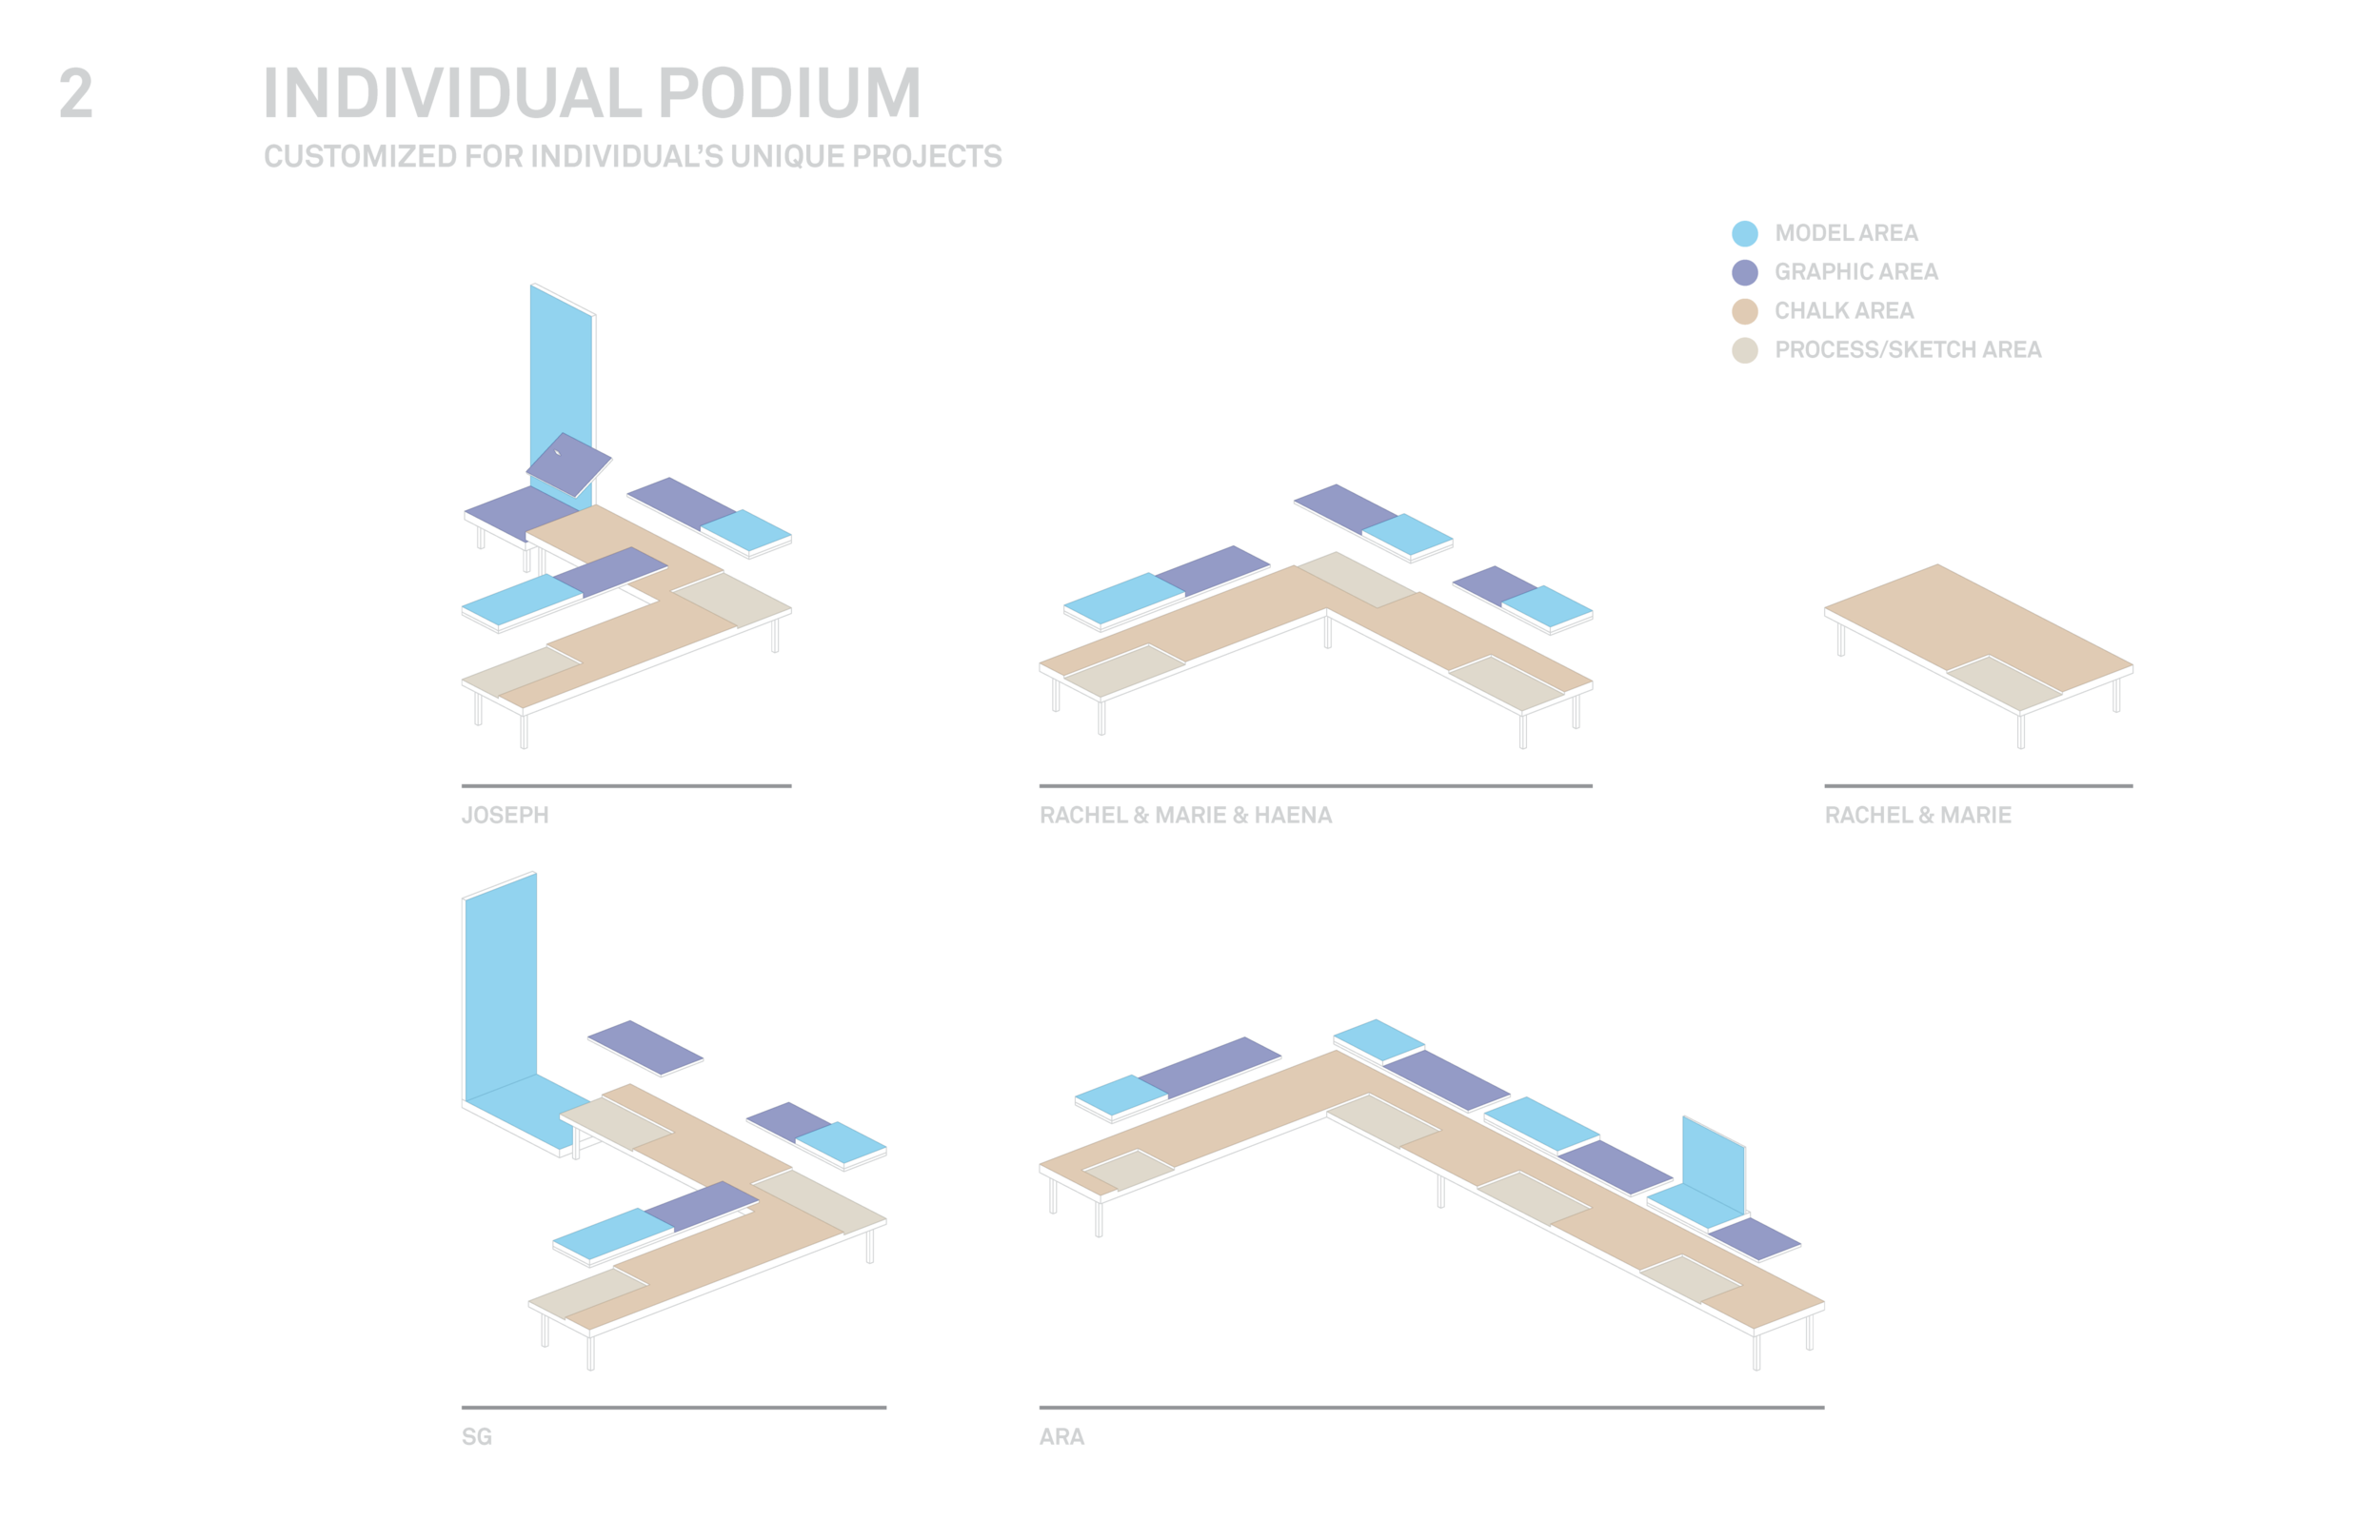 podium layouts2-02.png